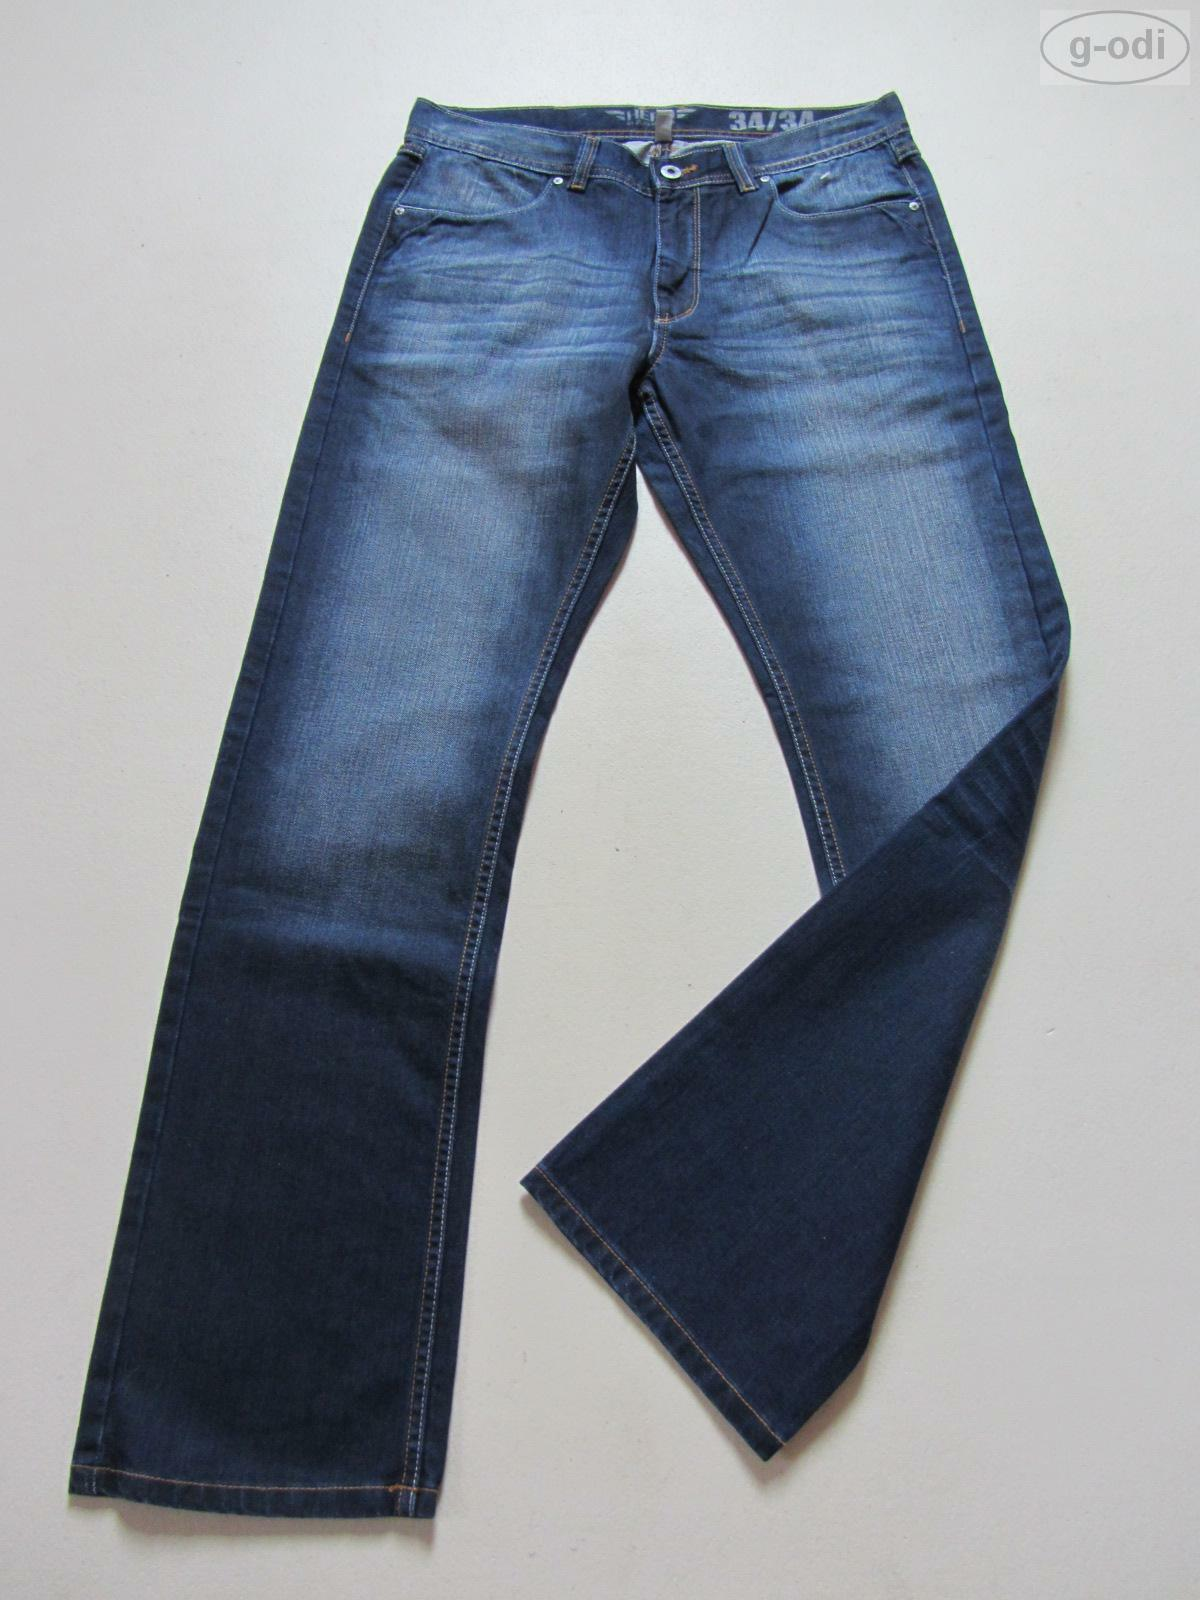 HERO by John Medoox Jeans Hose, W 34  L 30, NEU   Top Waschung   BOSTON Denim